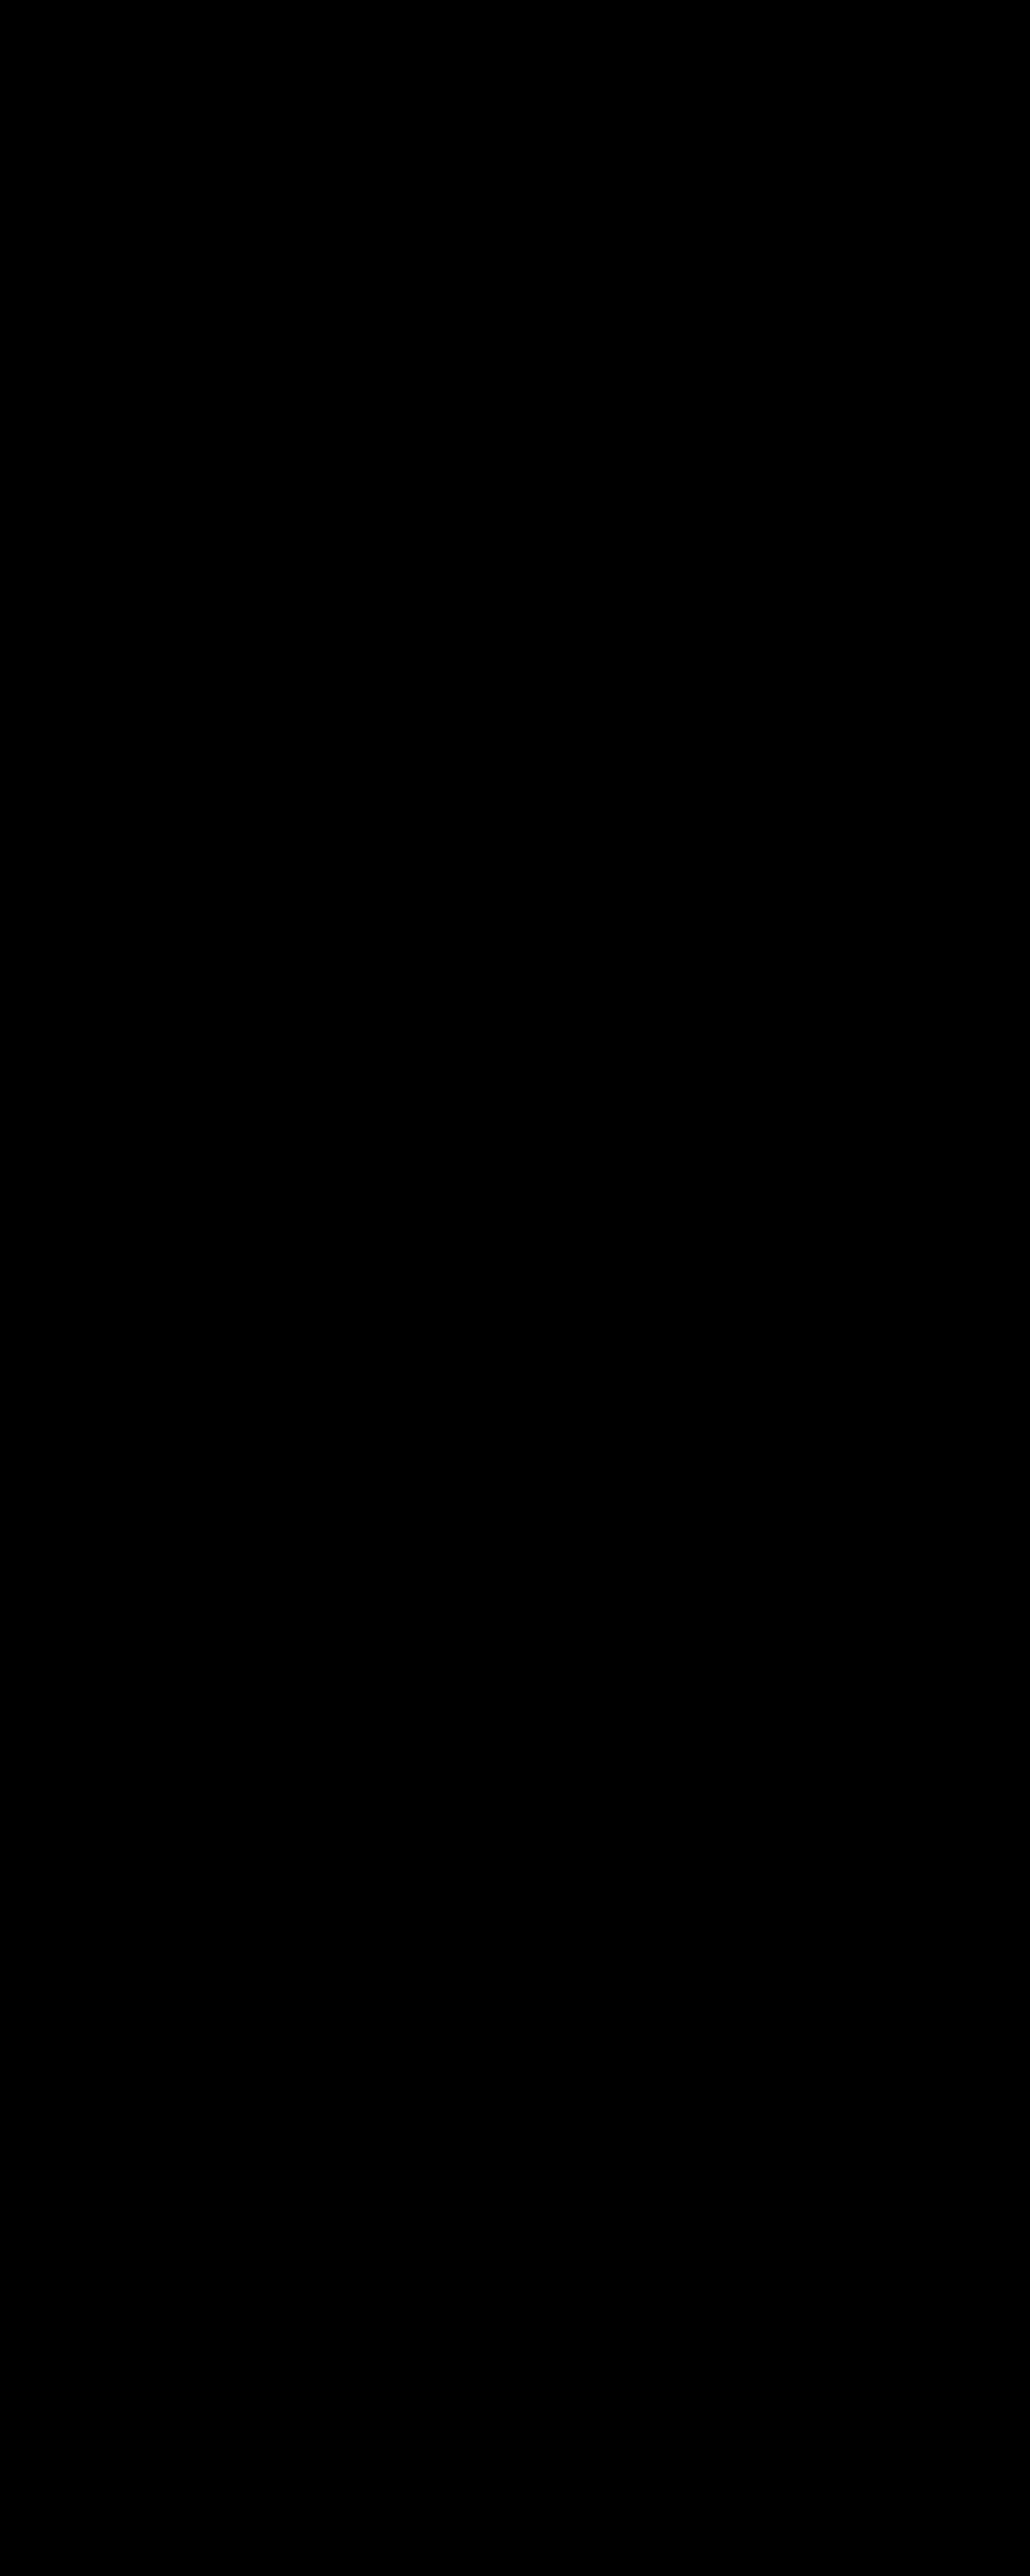 Silhouette at getdrawings com. Globe clipart symbol